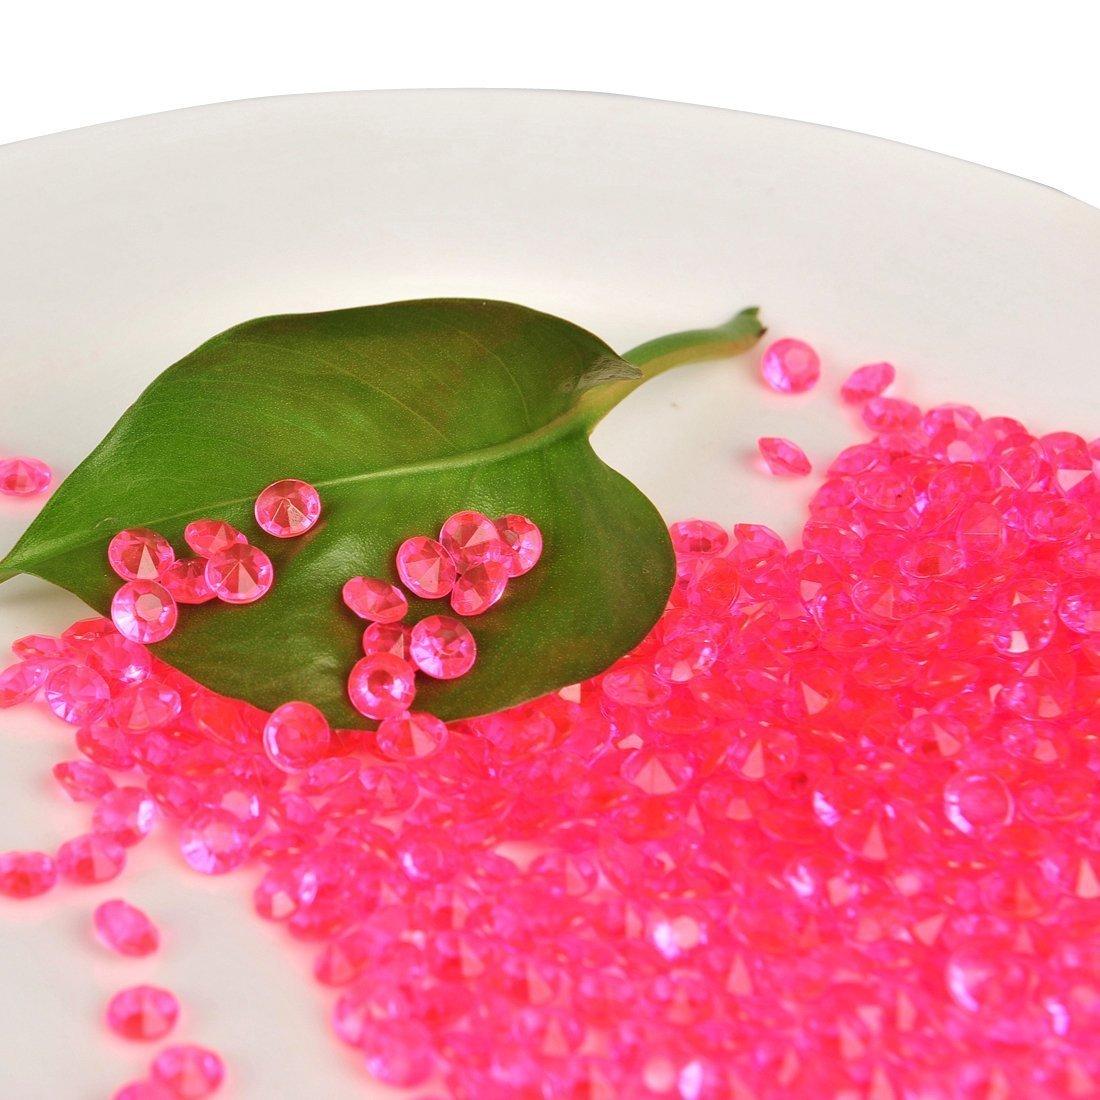 Vijara 1000 Diamond Table Confetti Wedding Bridal Shower Party Decorations 1/3ct 45mm Clear Pink